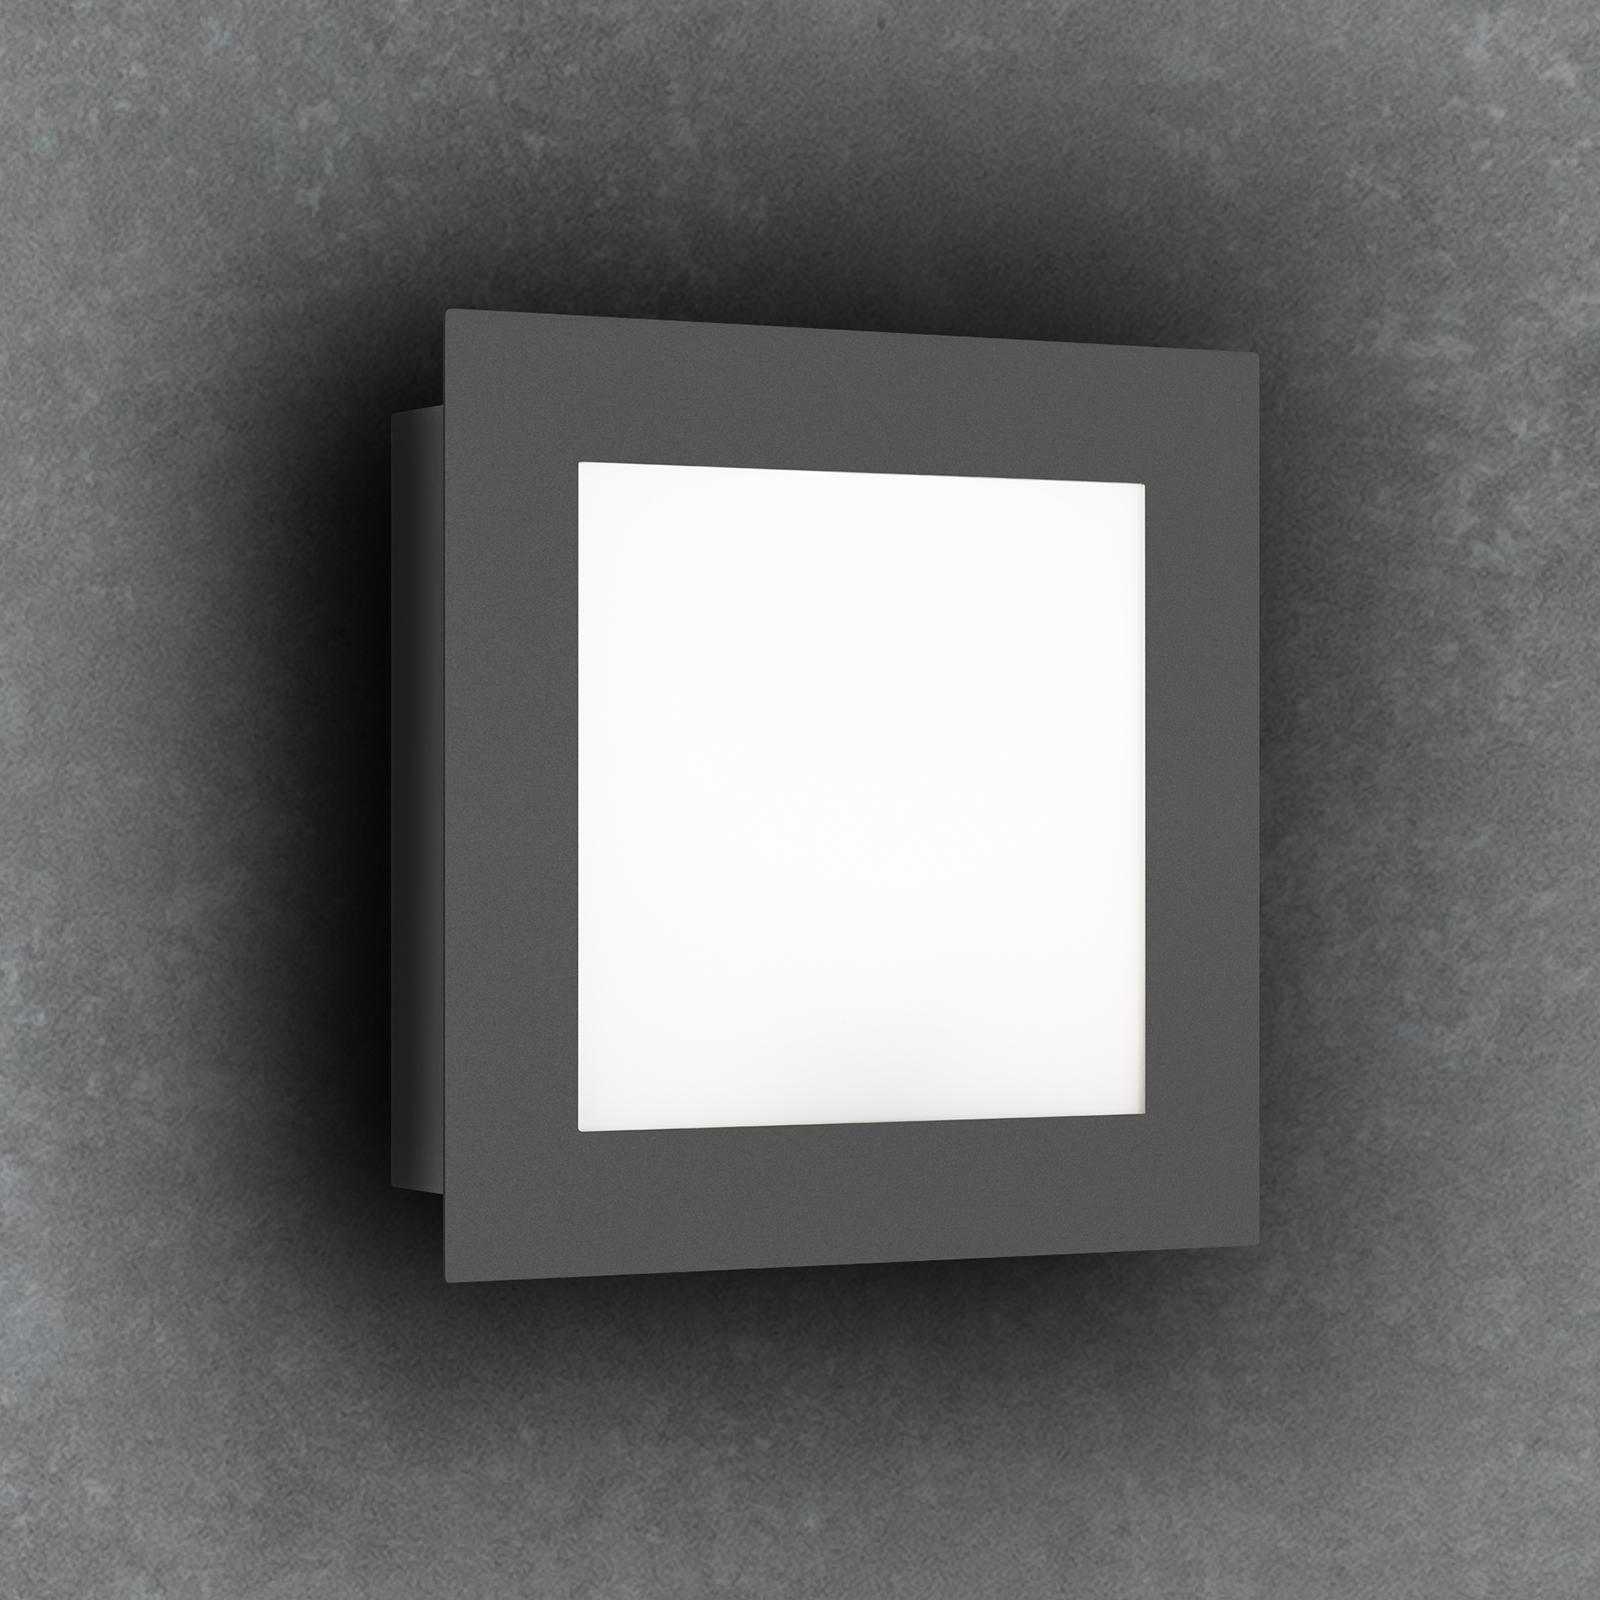 LED-ulkoseinälamppu 3007LED, grafiitti